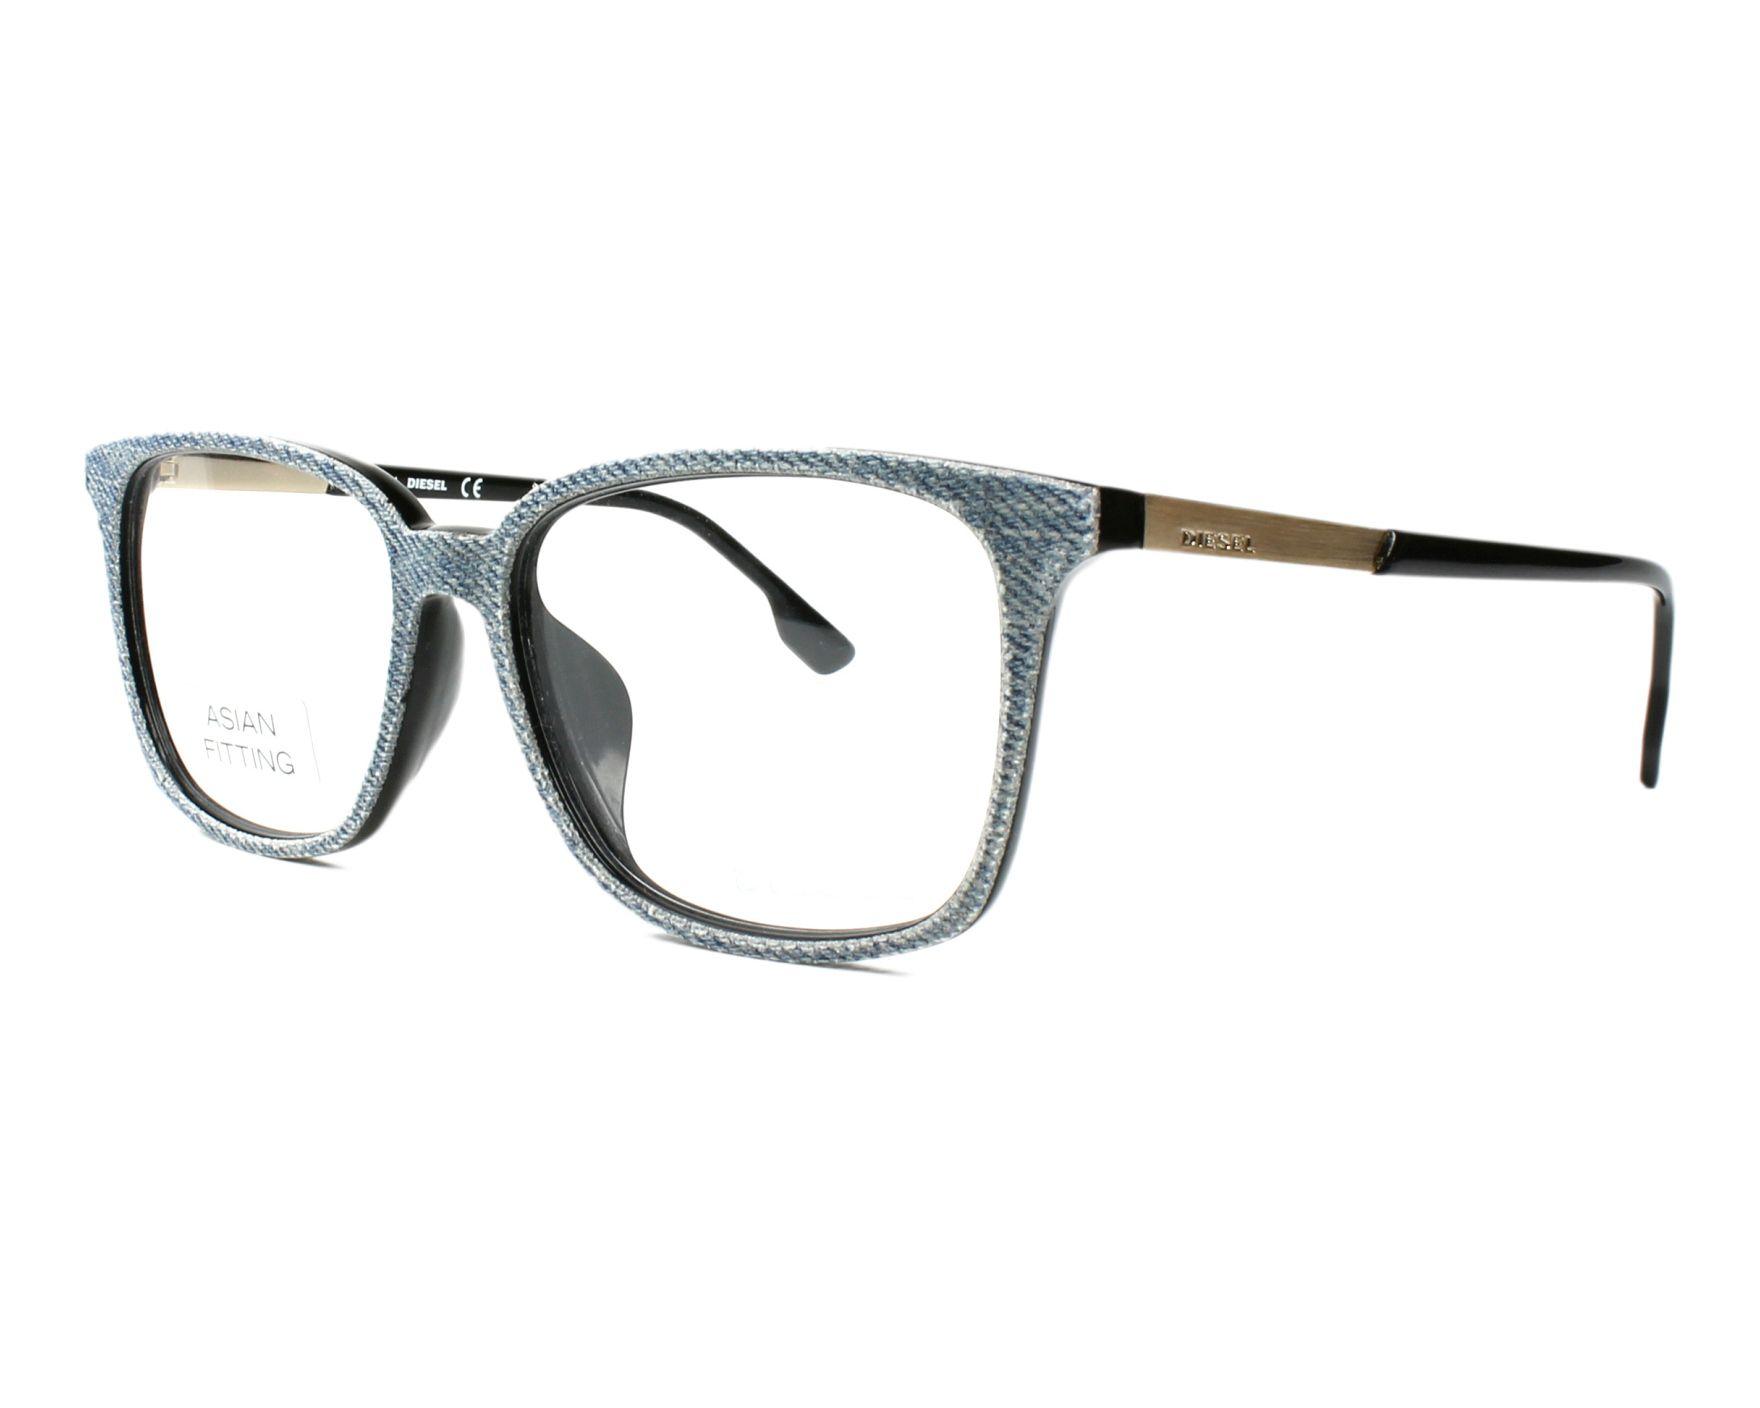 lunettes de vue de diesel en dl 5116 f 002. Black Bedroom Furniture Sets. Home Design Ideas